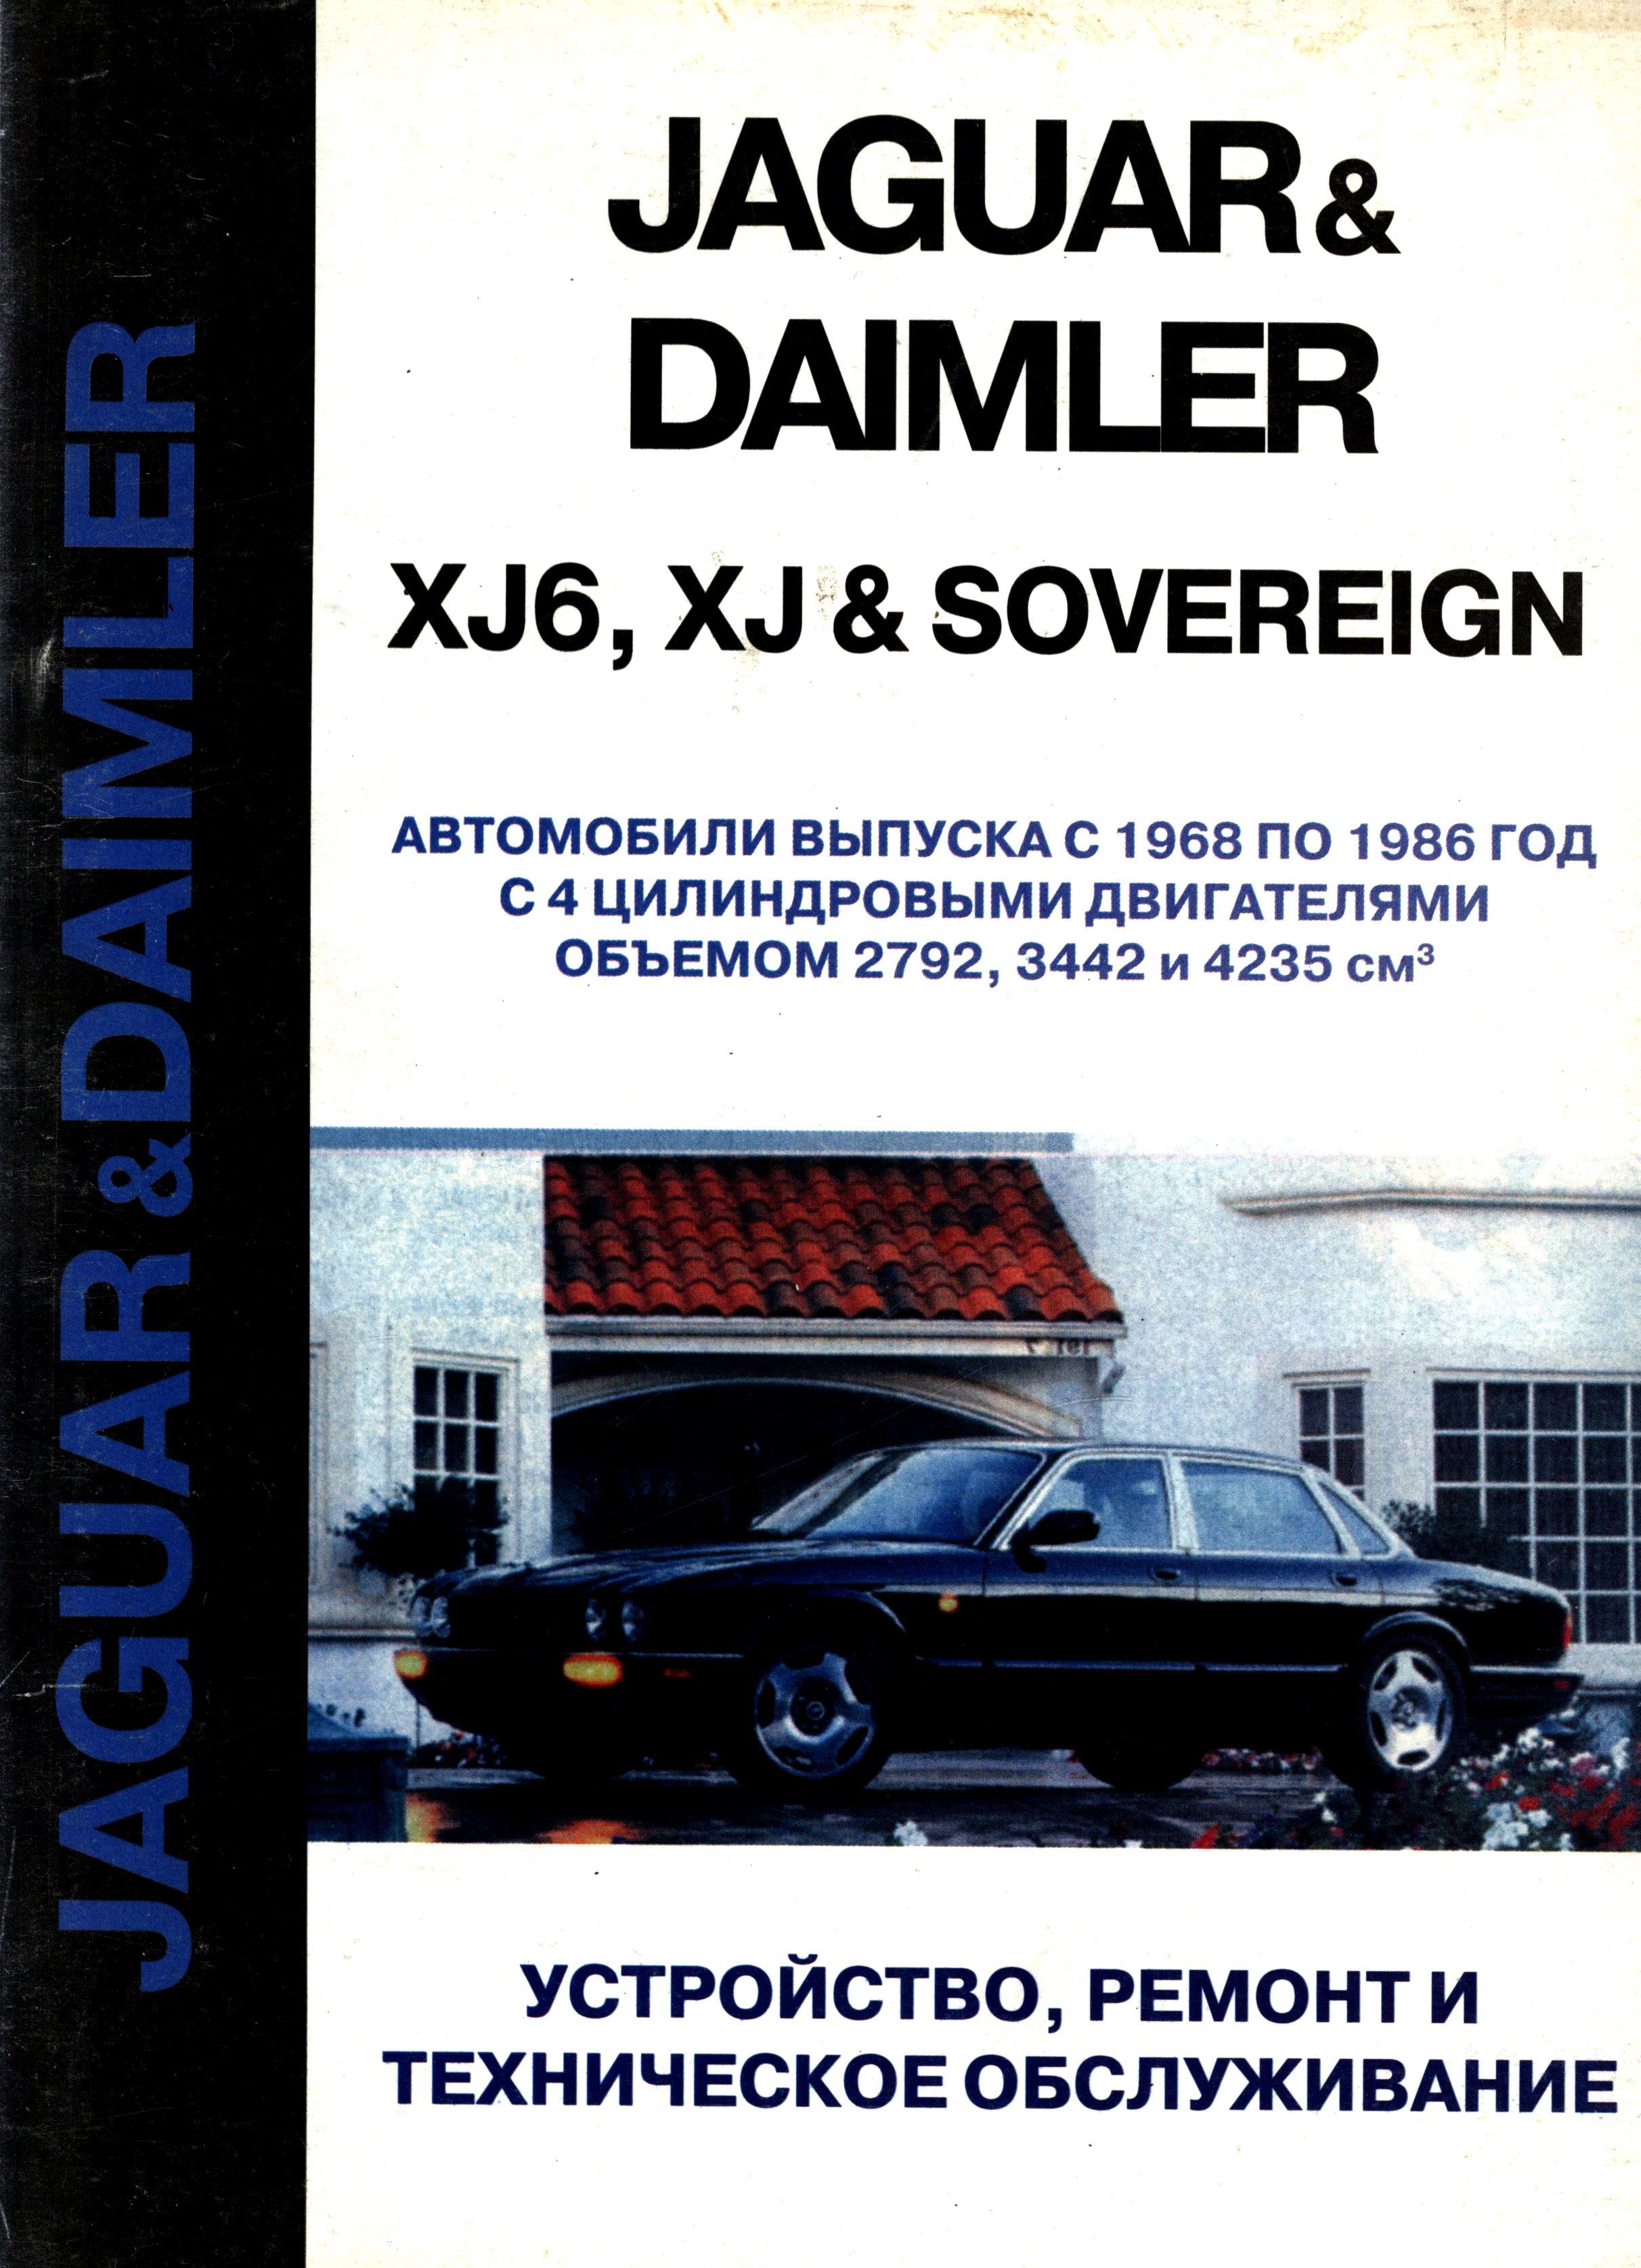 JAGUAR XJ / XJ6 / DAIMLER SOVEREIGN 1968-1986 Книга по ремонту и техобслуживанию